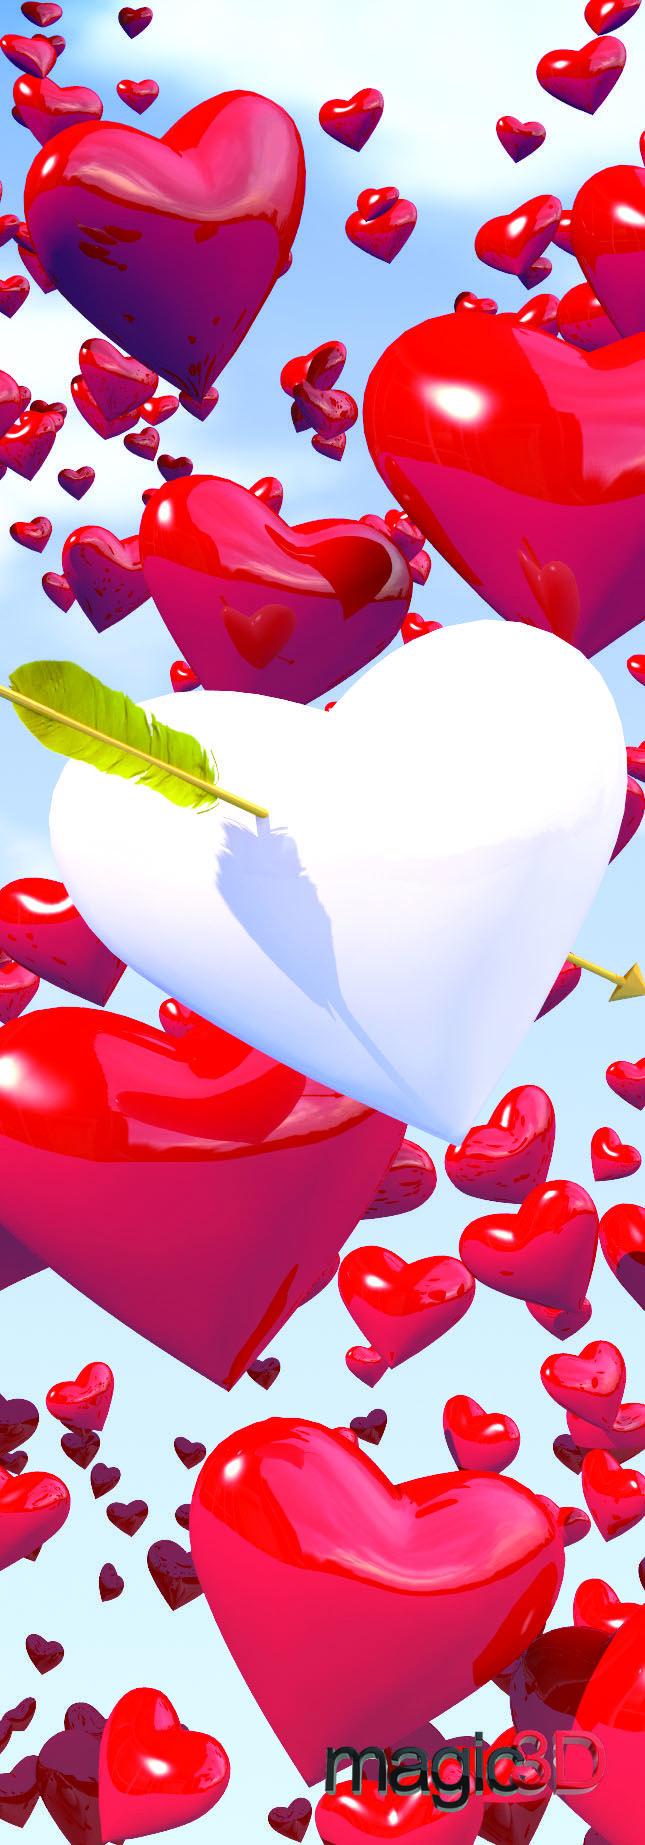 "Magic 3D Hearts - Bookmark/6"" Ruler #013"